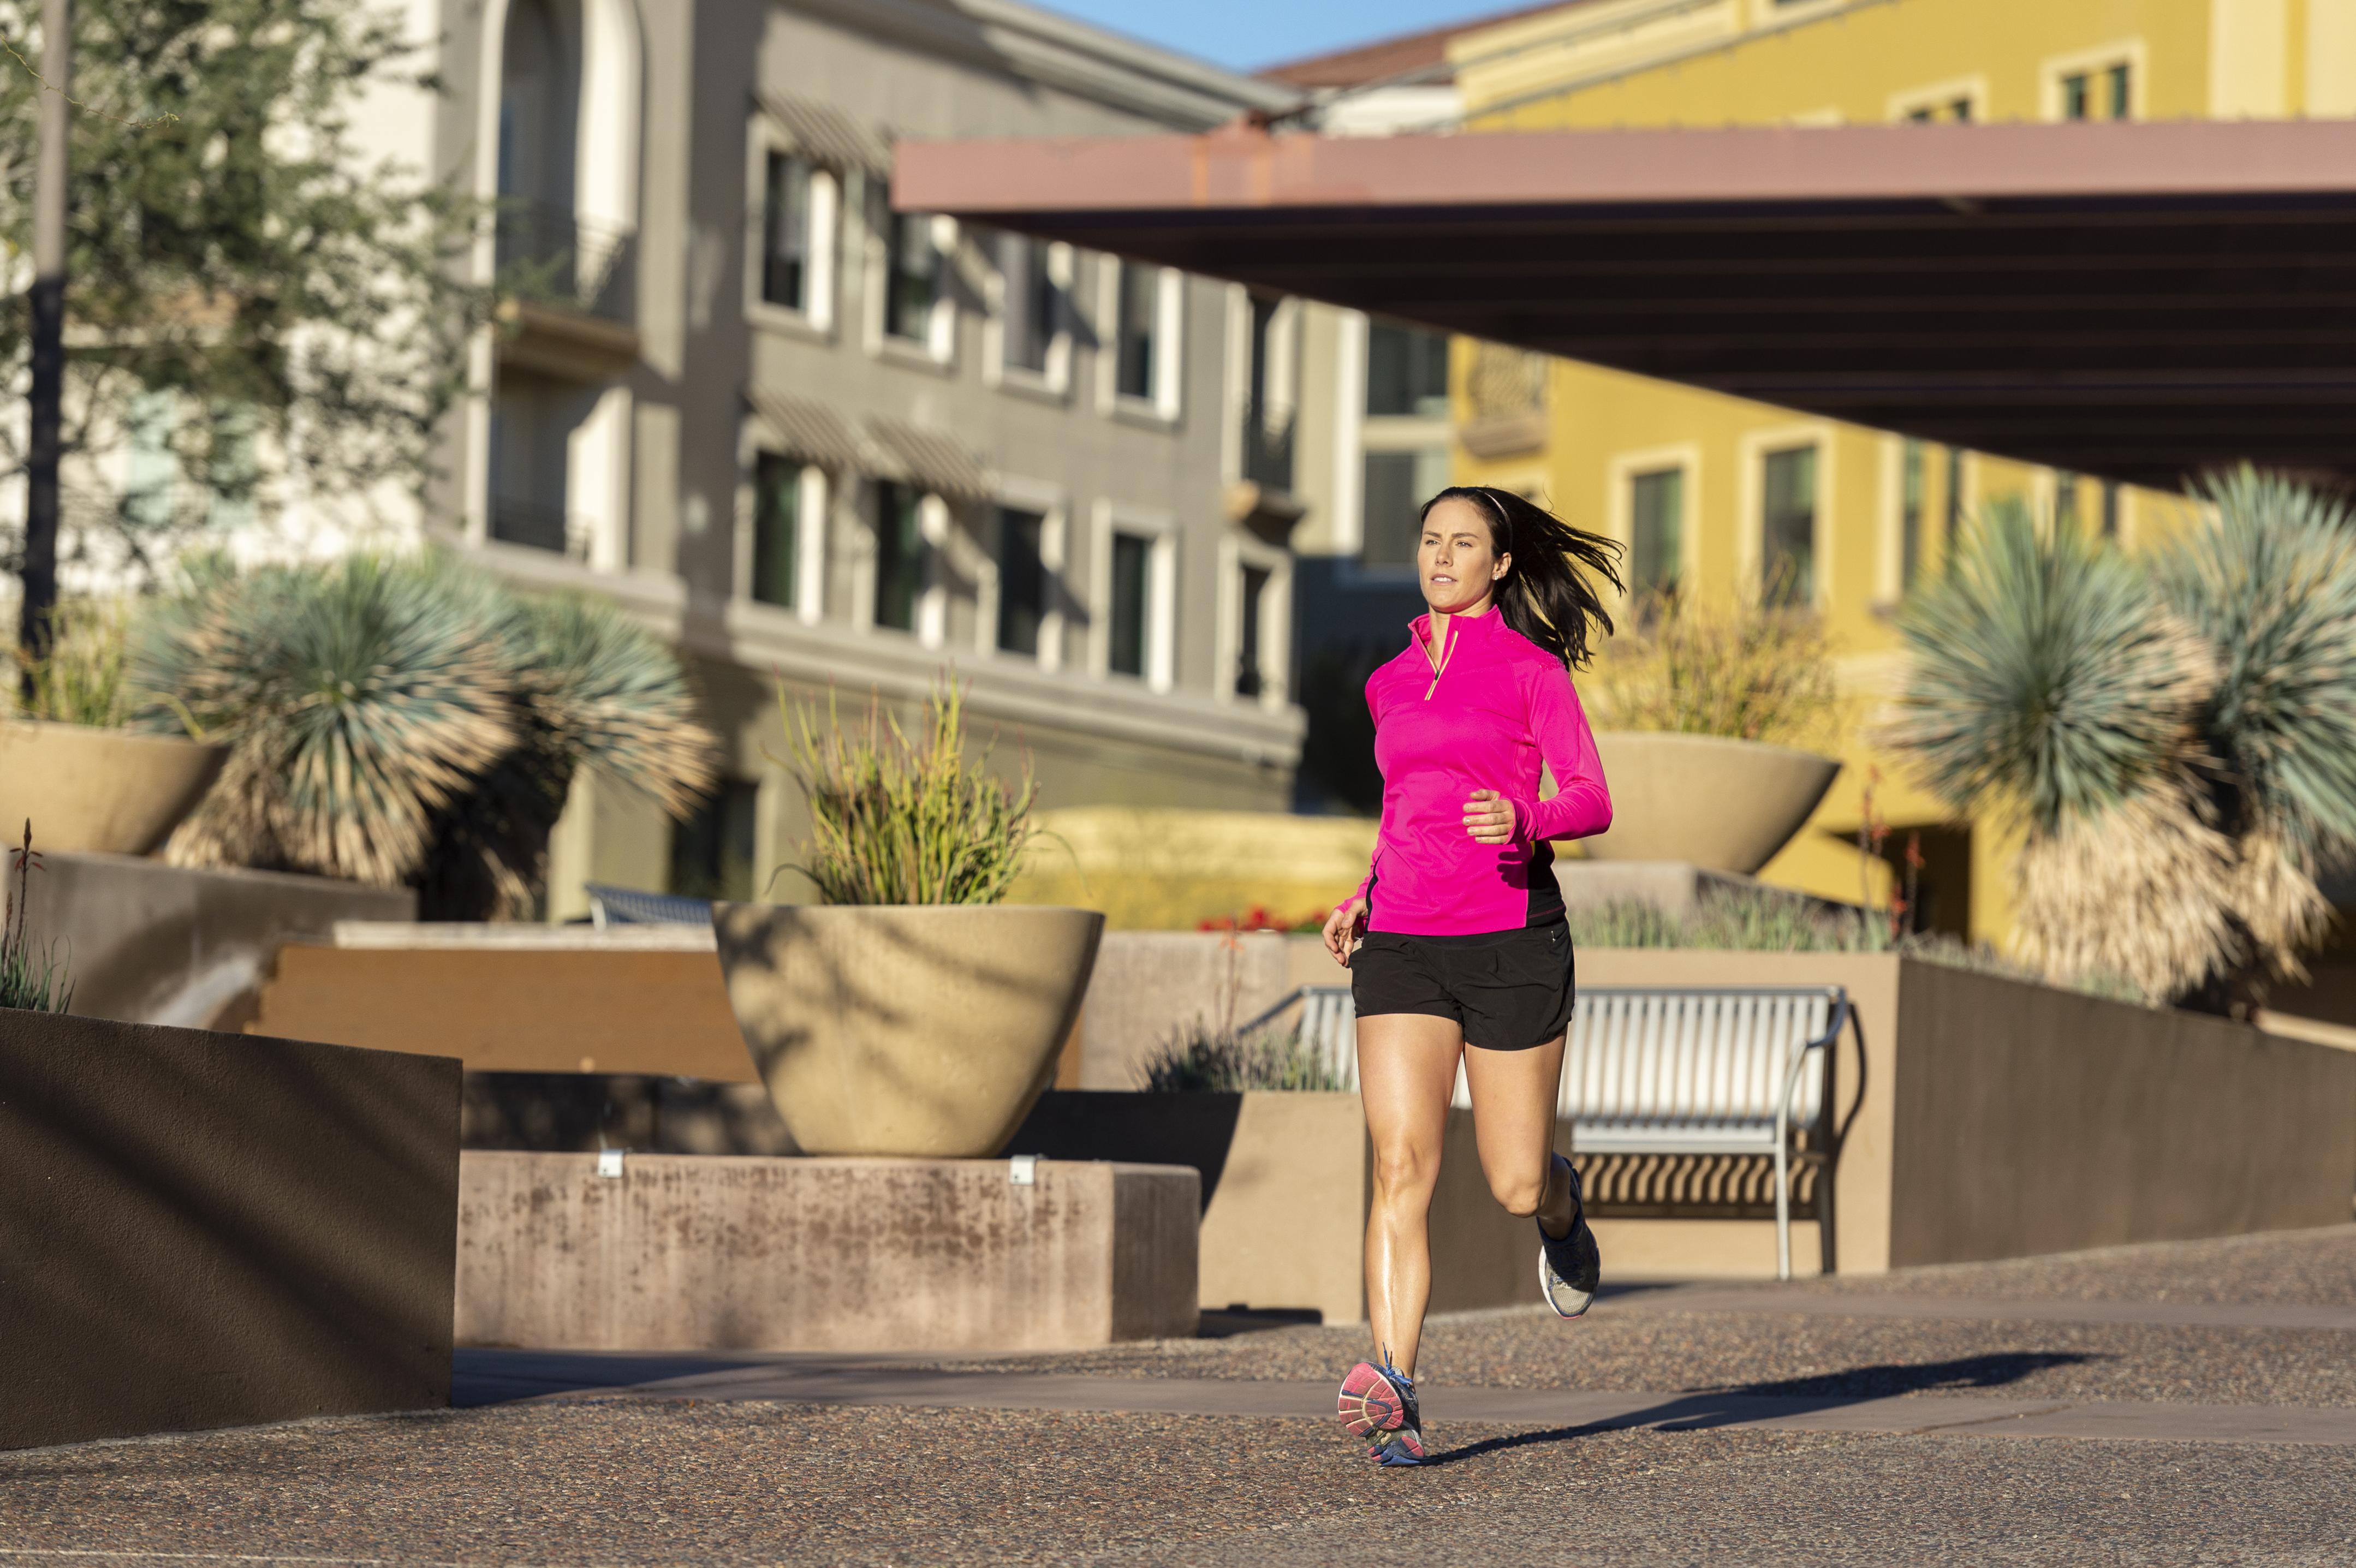 Beautiful Caucasian woman running in town